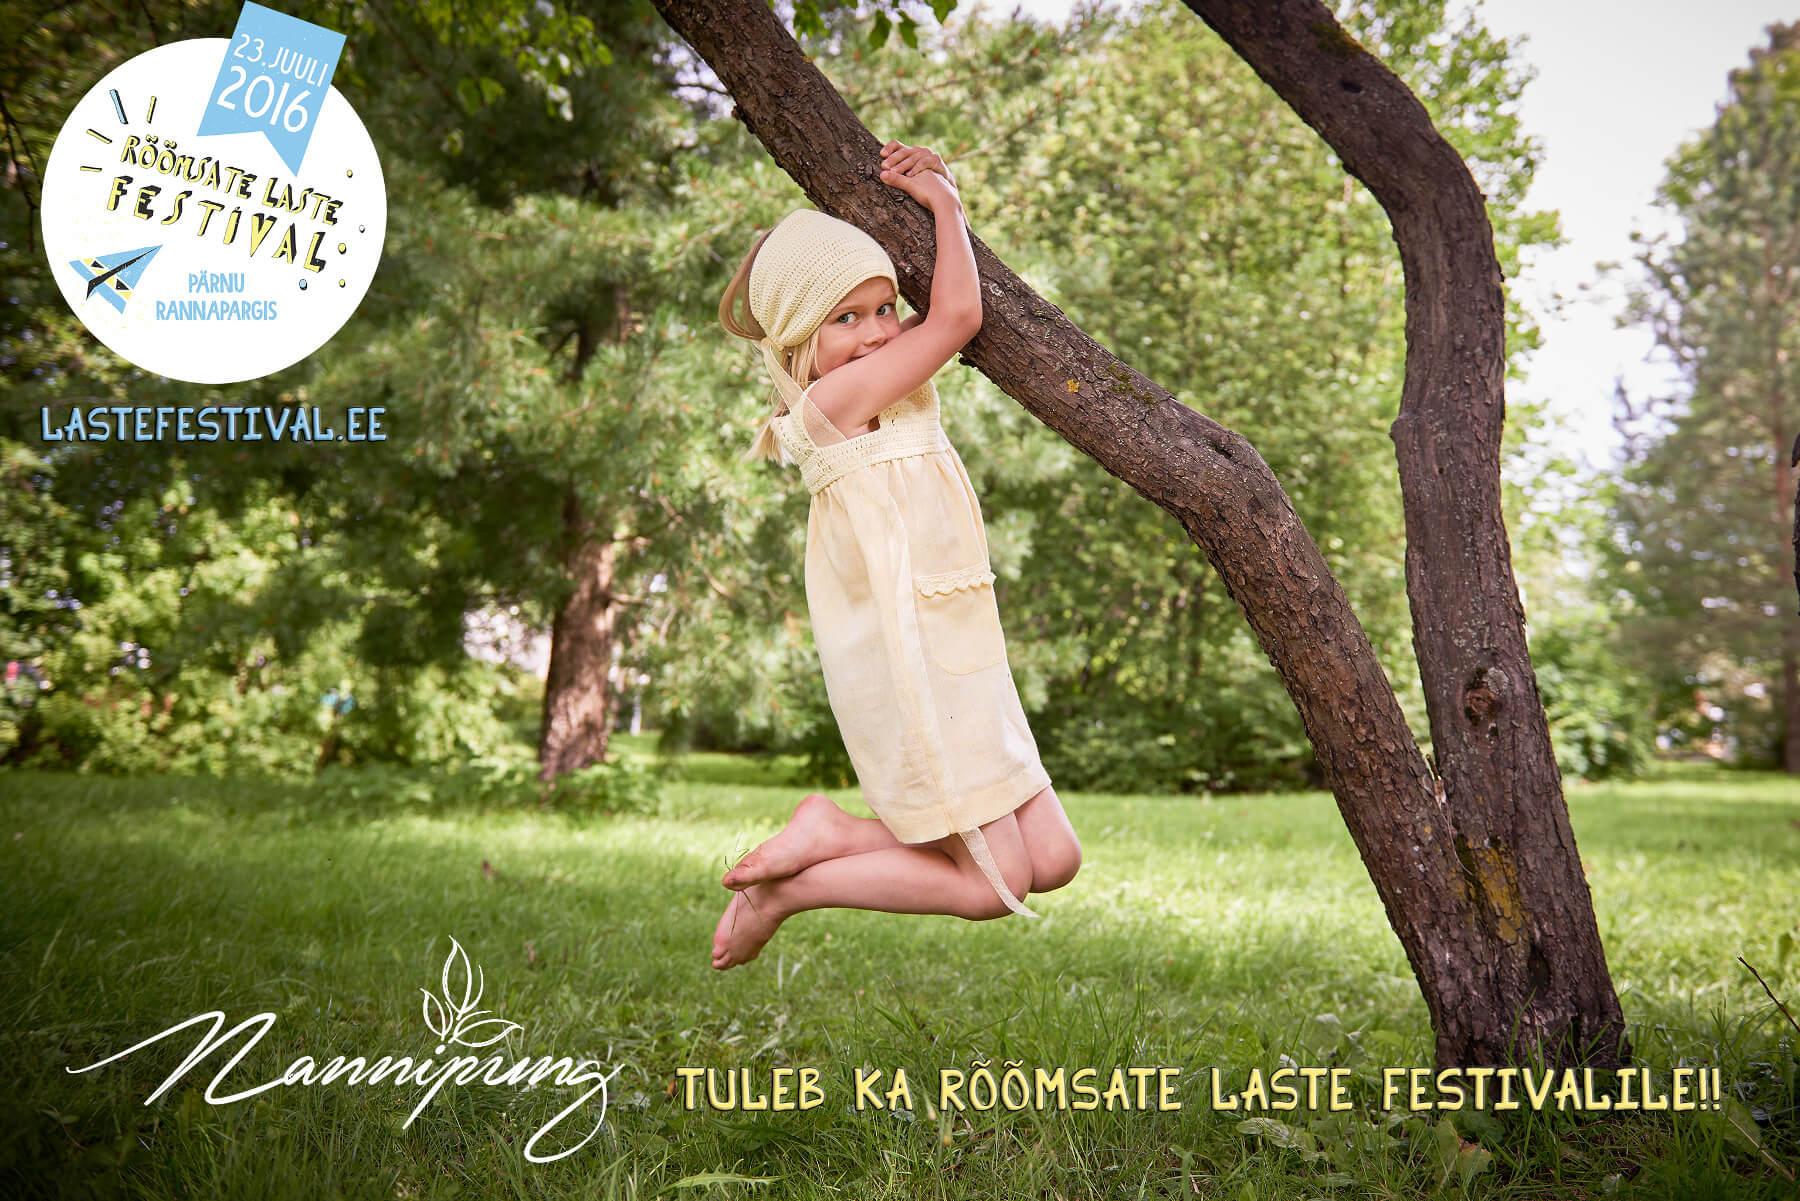 Nannipung rõõmsate laste festivalil